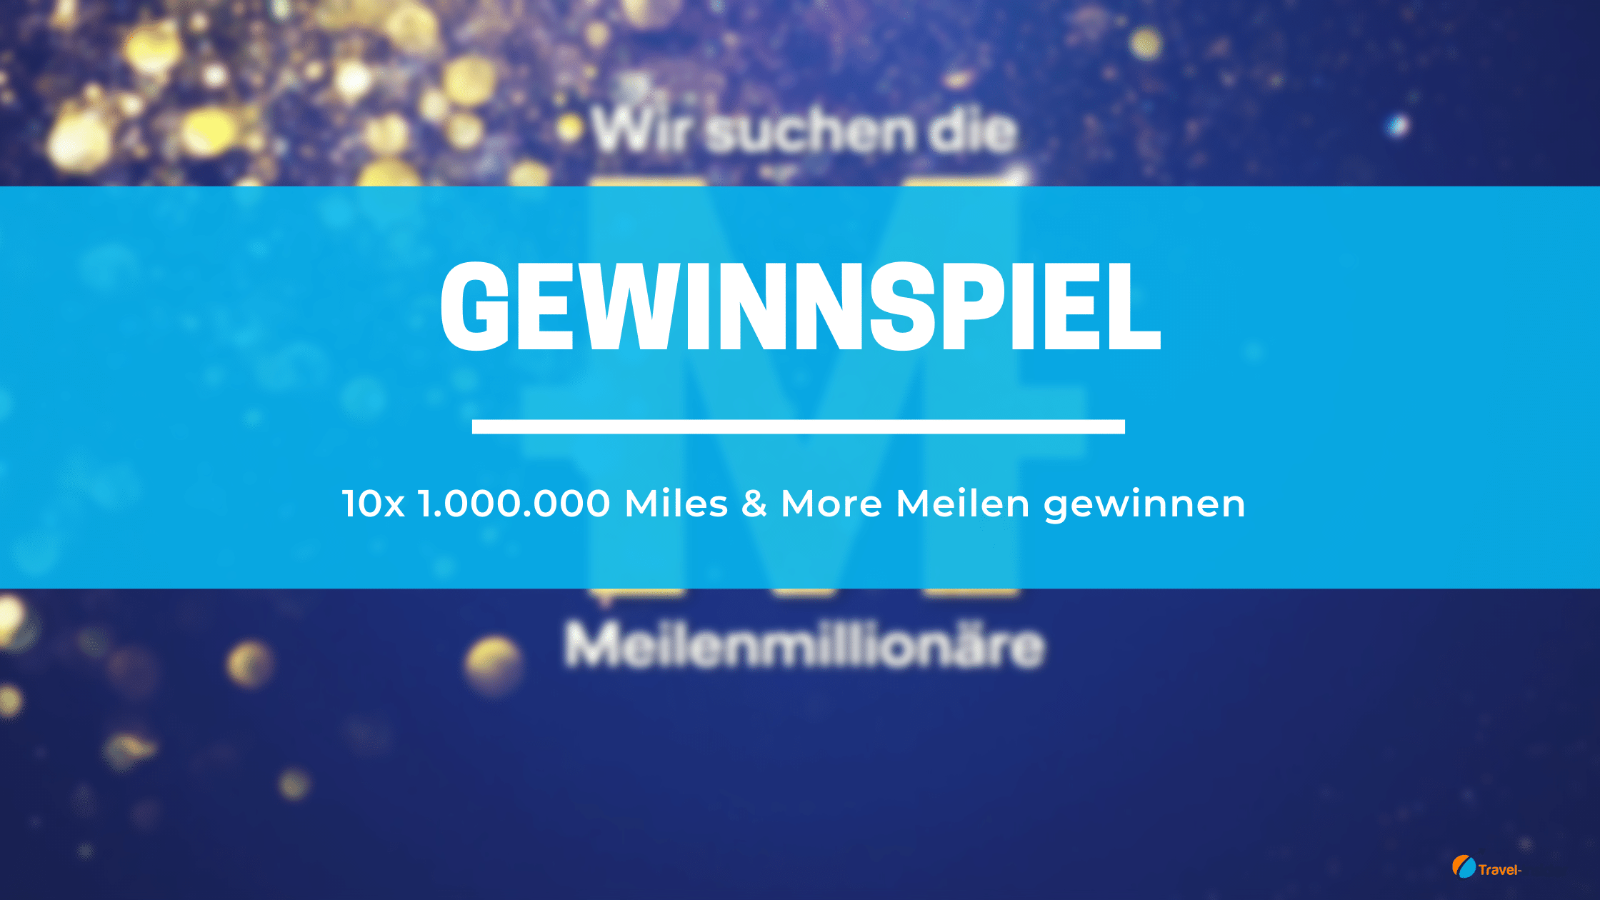 Gewinnspiel: 10x 1.000.000 Miles & More Meilen